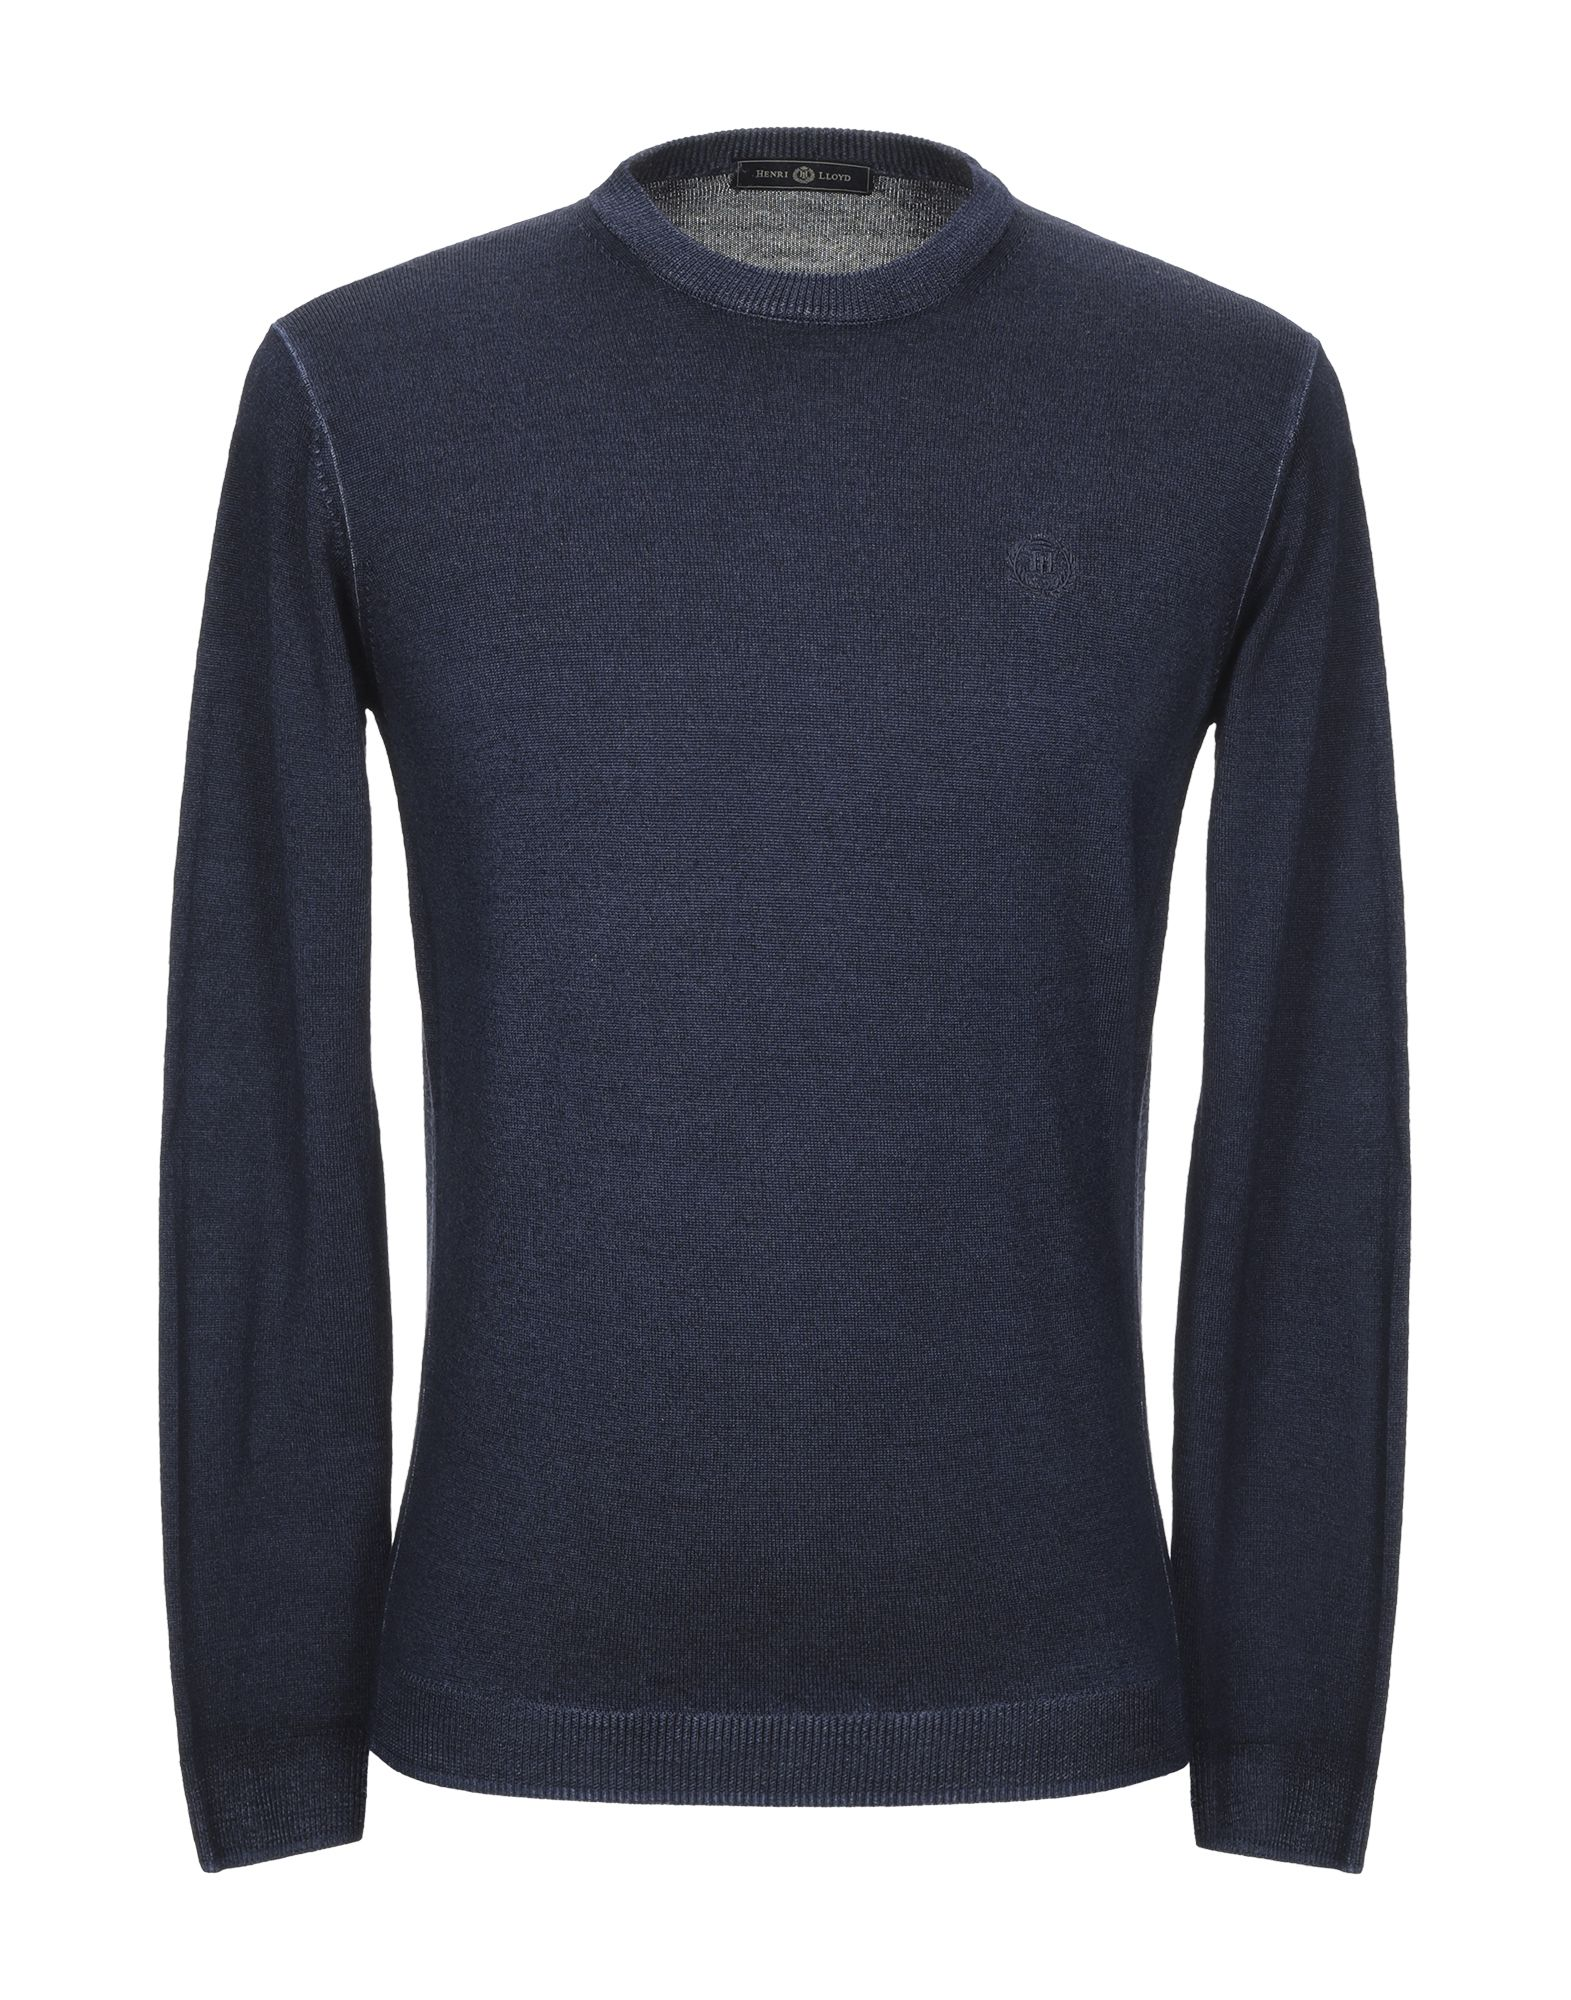 HENRI LLOYD Sweaters - Item 39964259